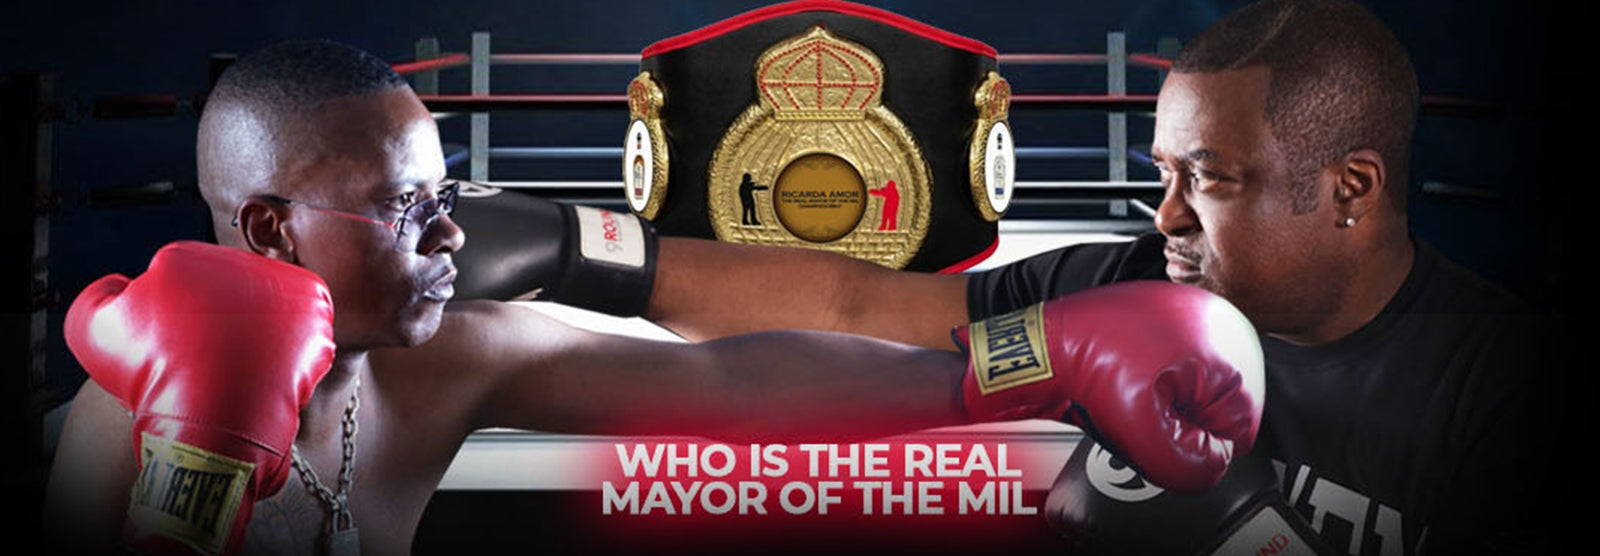 "Celebrity Boxing Match: O.G. TWEEZY vs REGGIE ""SMOOTH  AZ BUTTA"" BROWN"